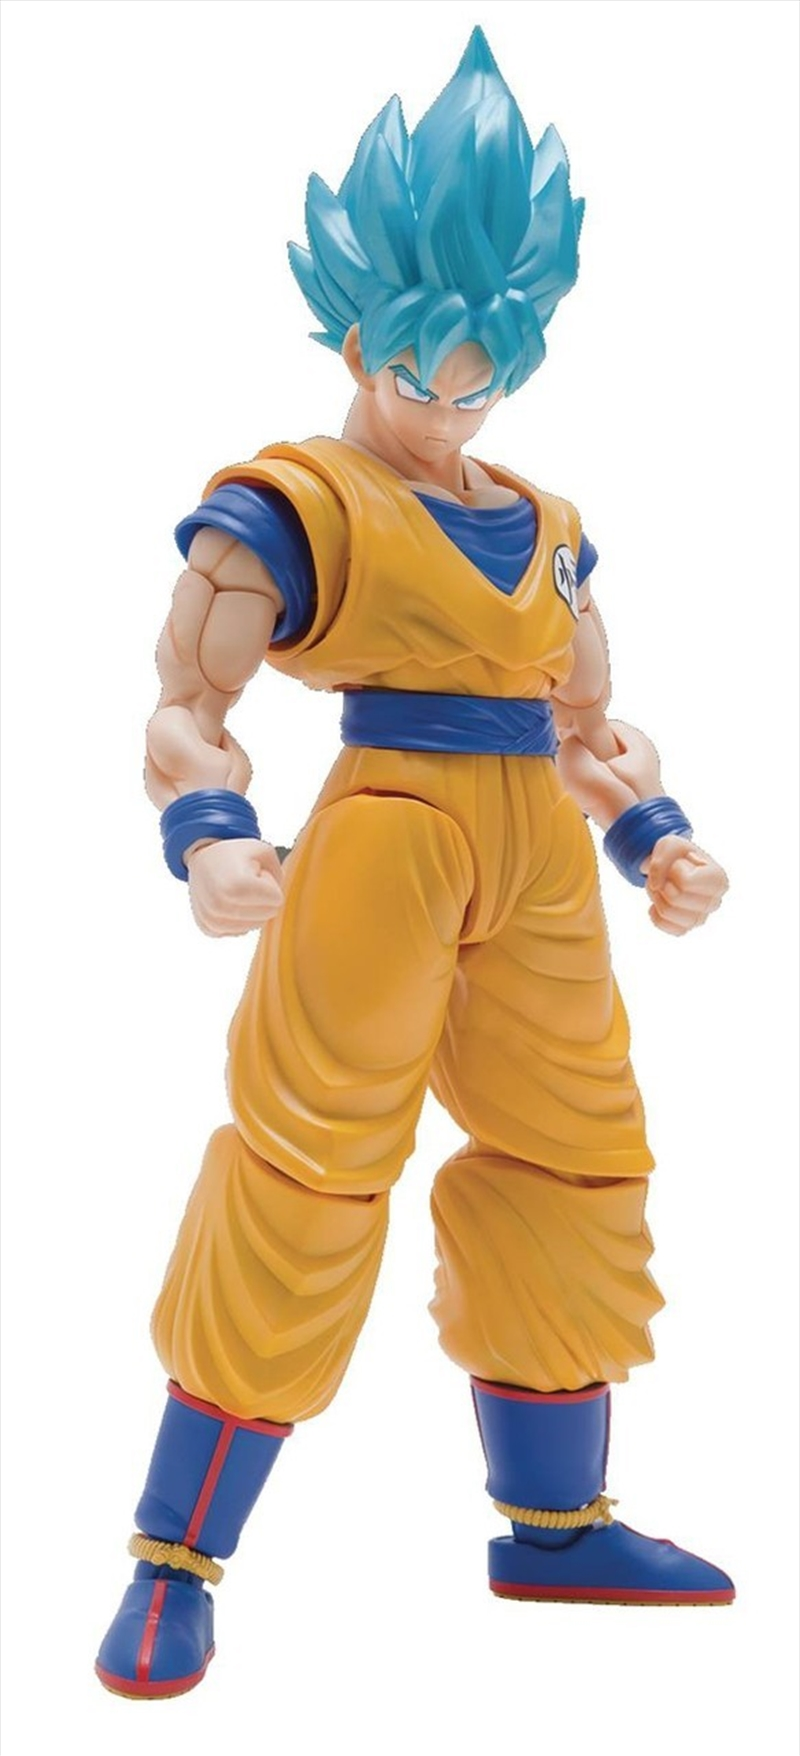 Dragon Ball - Ssgss Son Goku Figurerise | Collectable